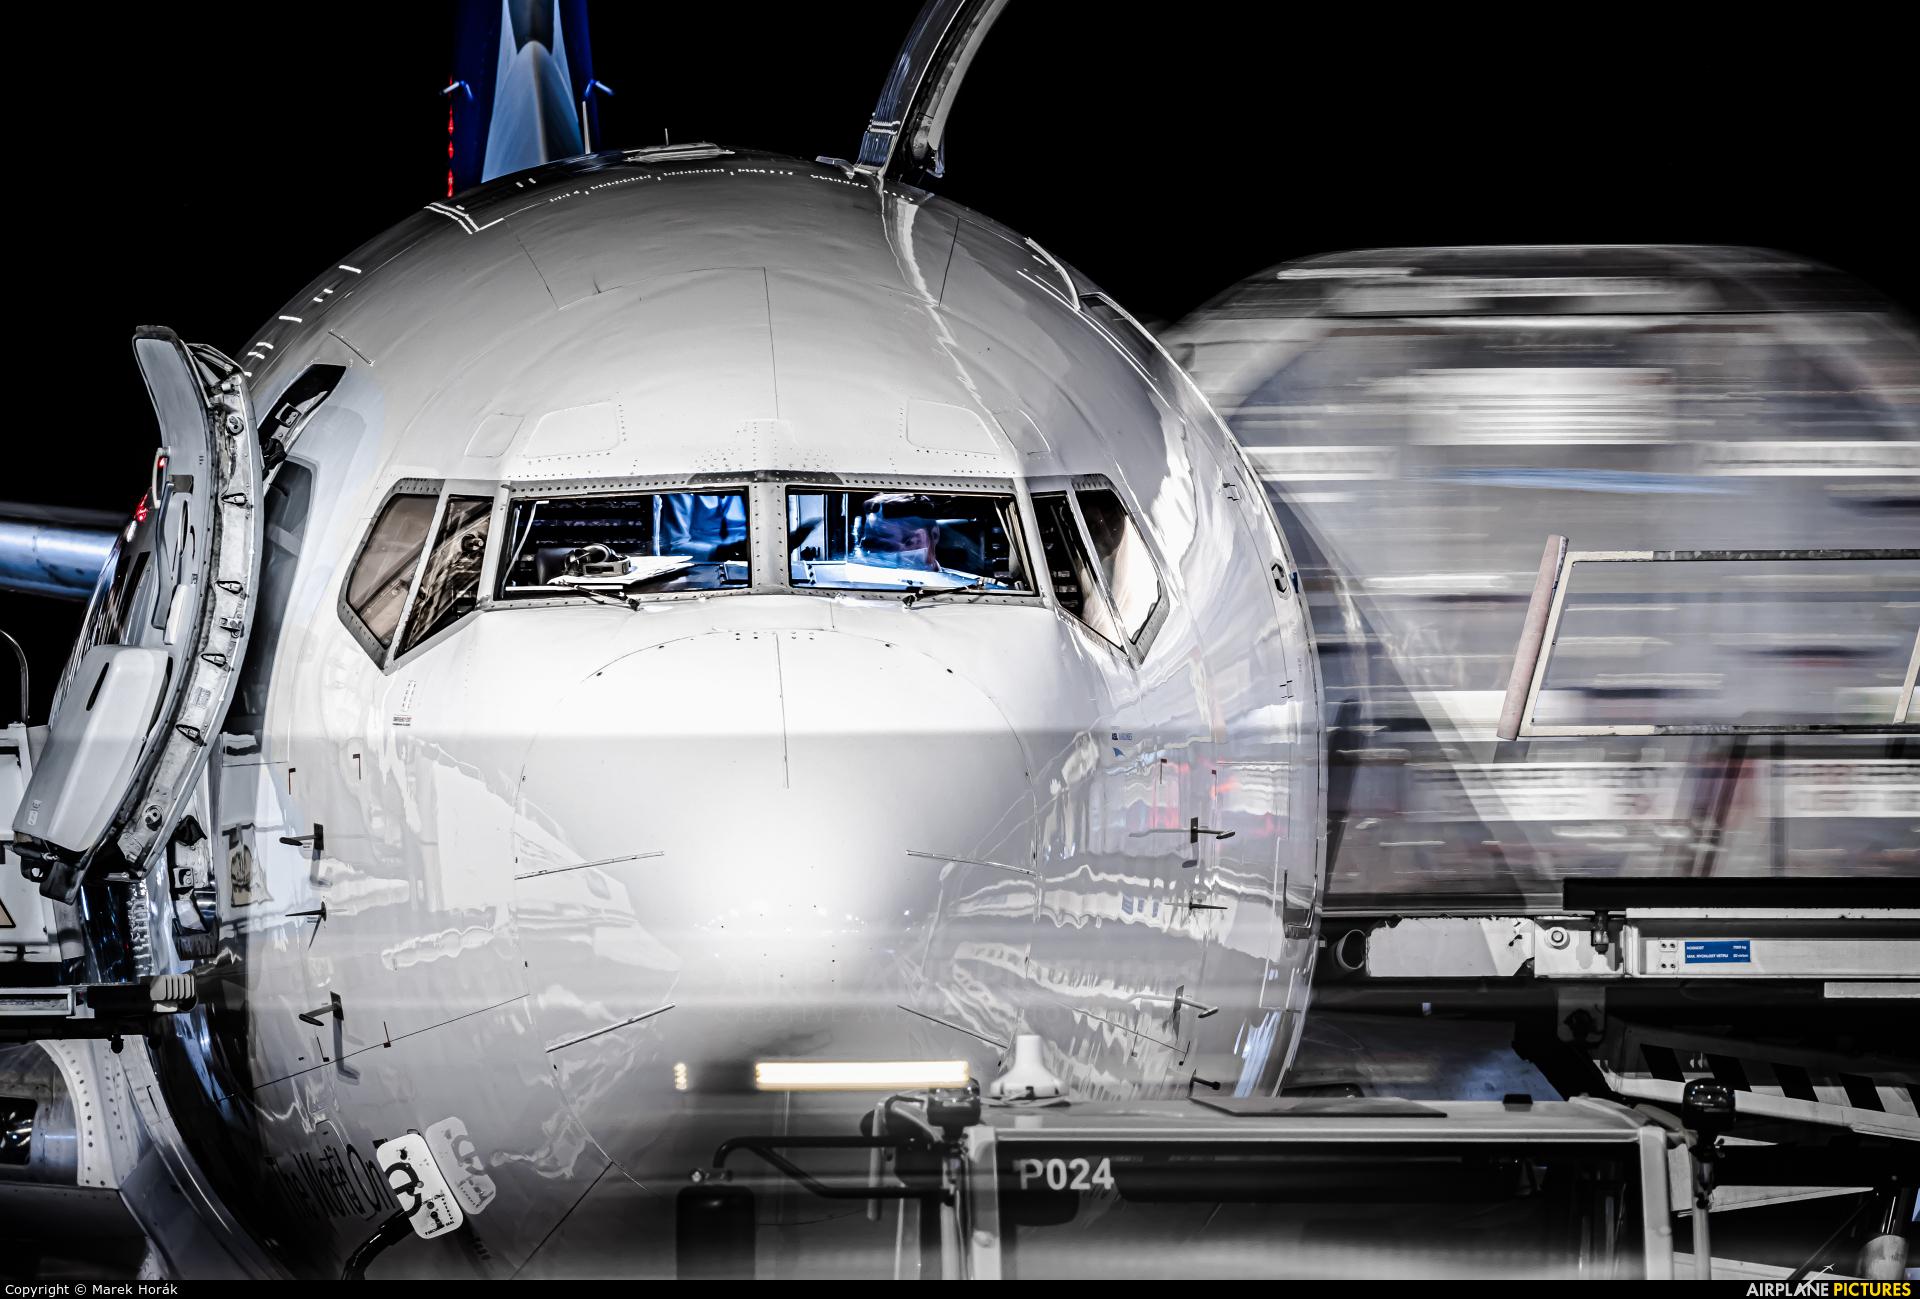 FedEx Federal Express OE-IAP aircraft at Prague - Václav Havel